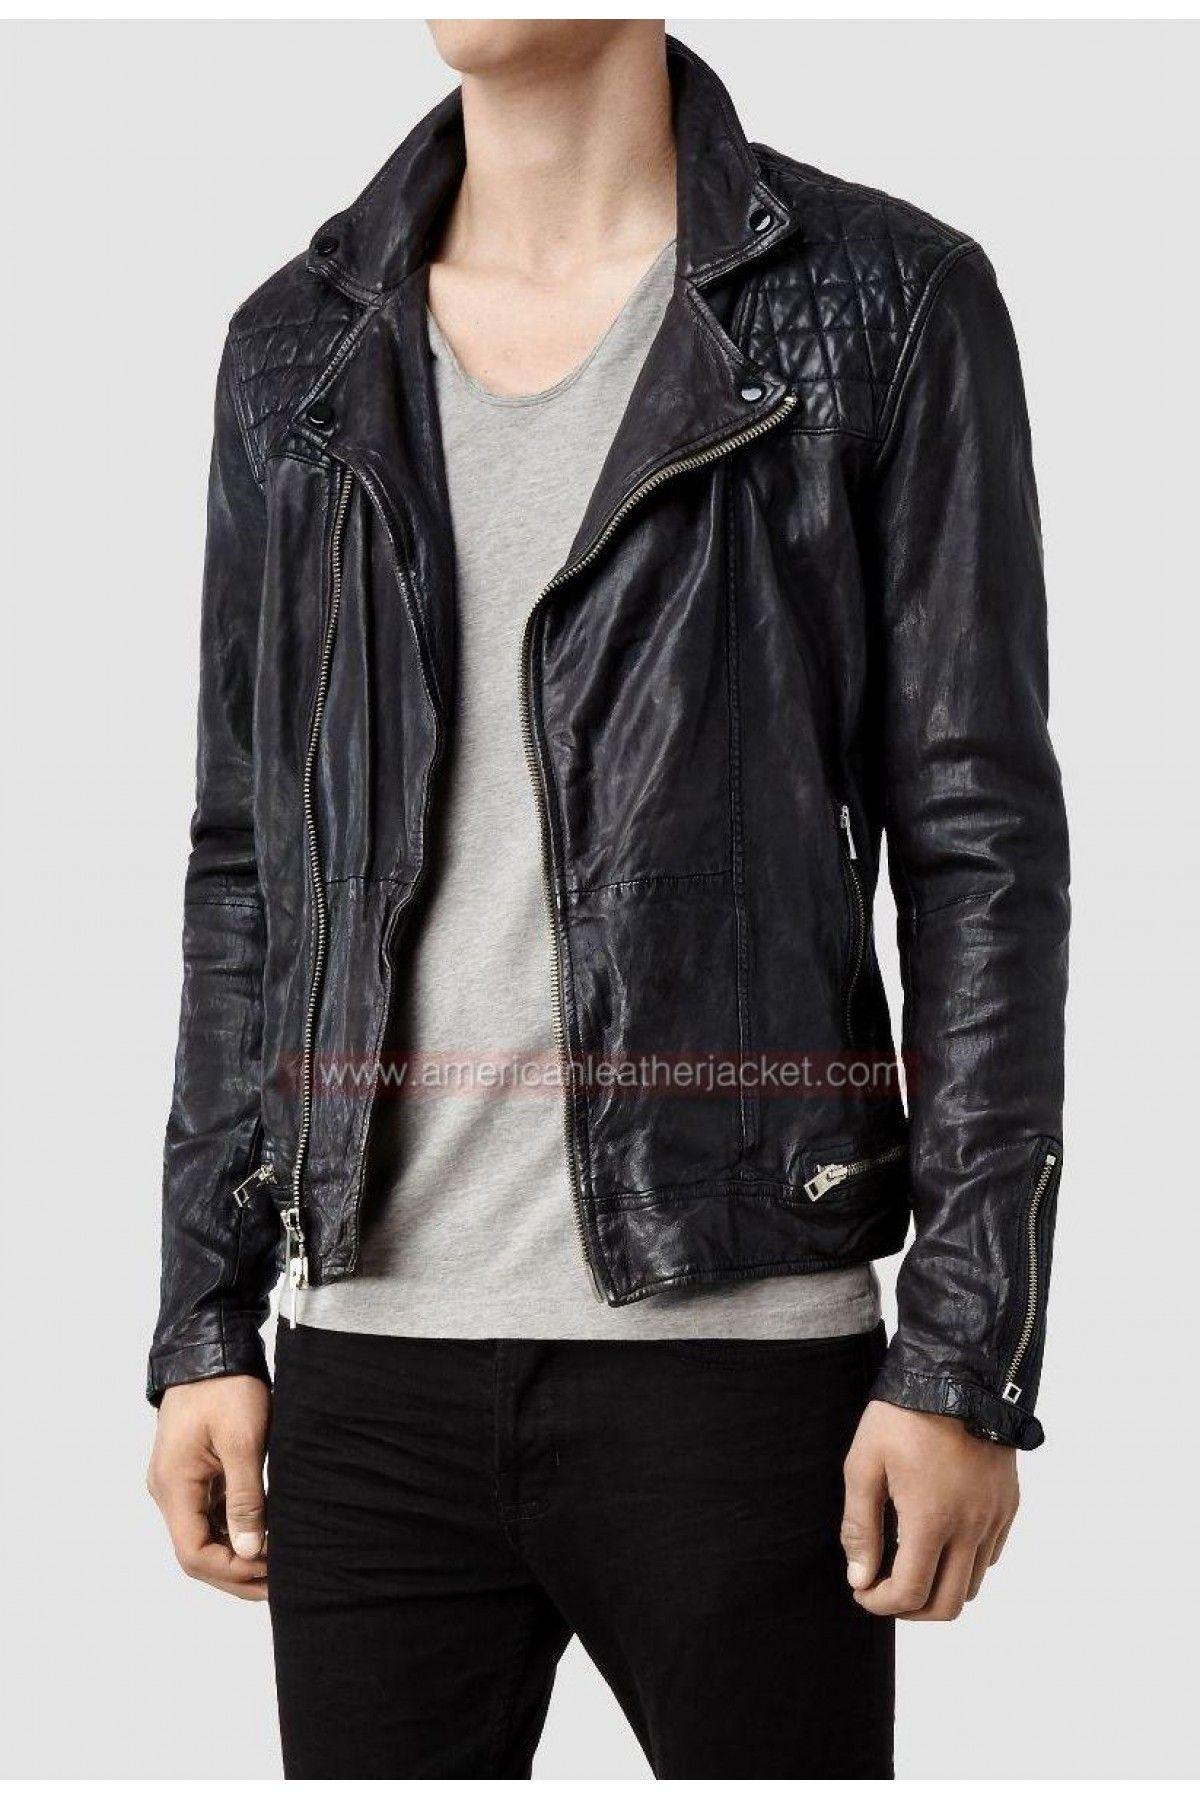 The Originals Klaus Mikaelson Leather Jacket Season 2 Joseph